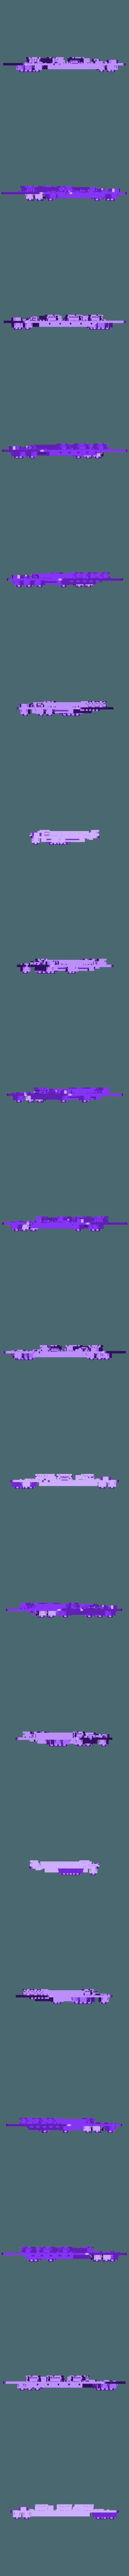 pyBadge.stl Download free STL file PyBadge Case with Flip Out Mic (TensorFlow Lite Kit) • Template to 3D print, Adafruit